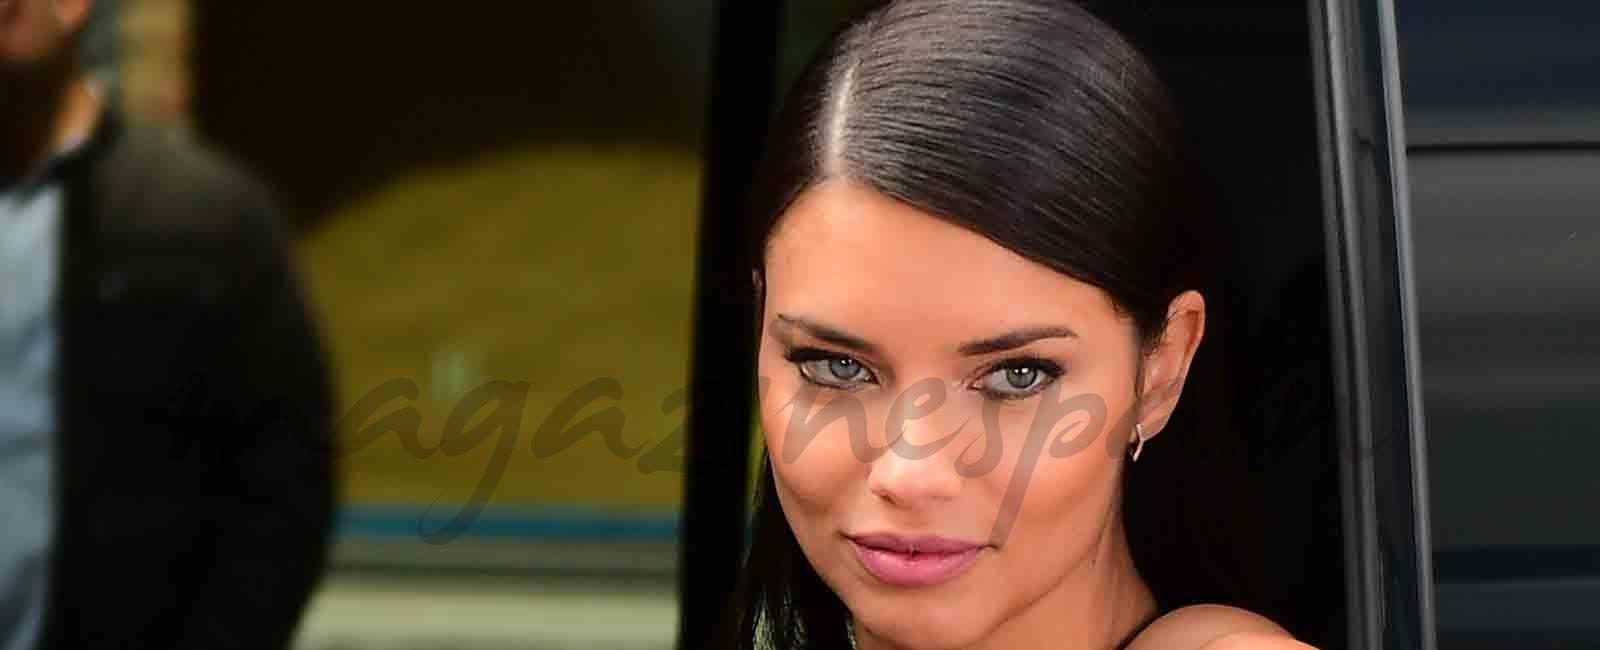 Adriana Lima, impresionante mujer de rojo